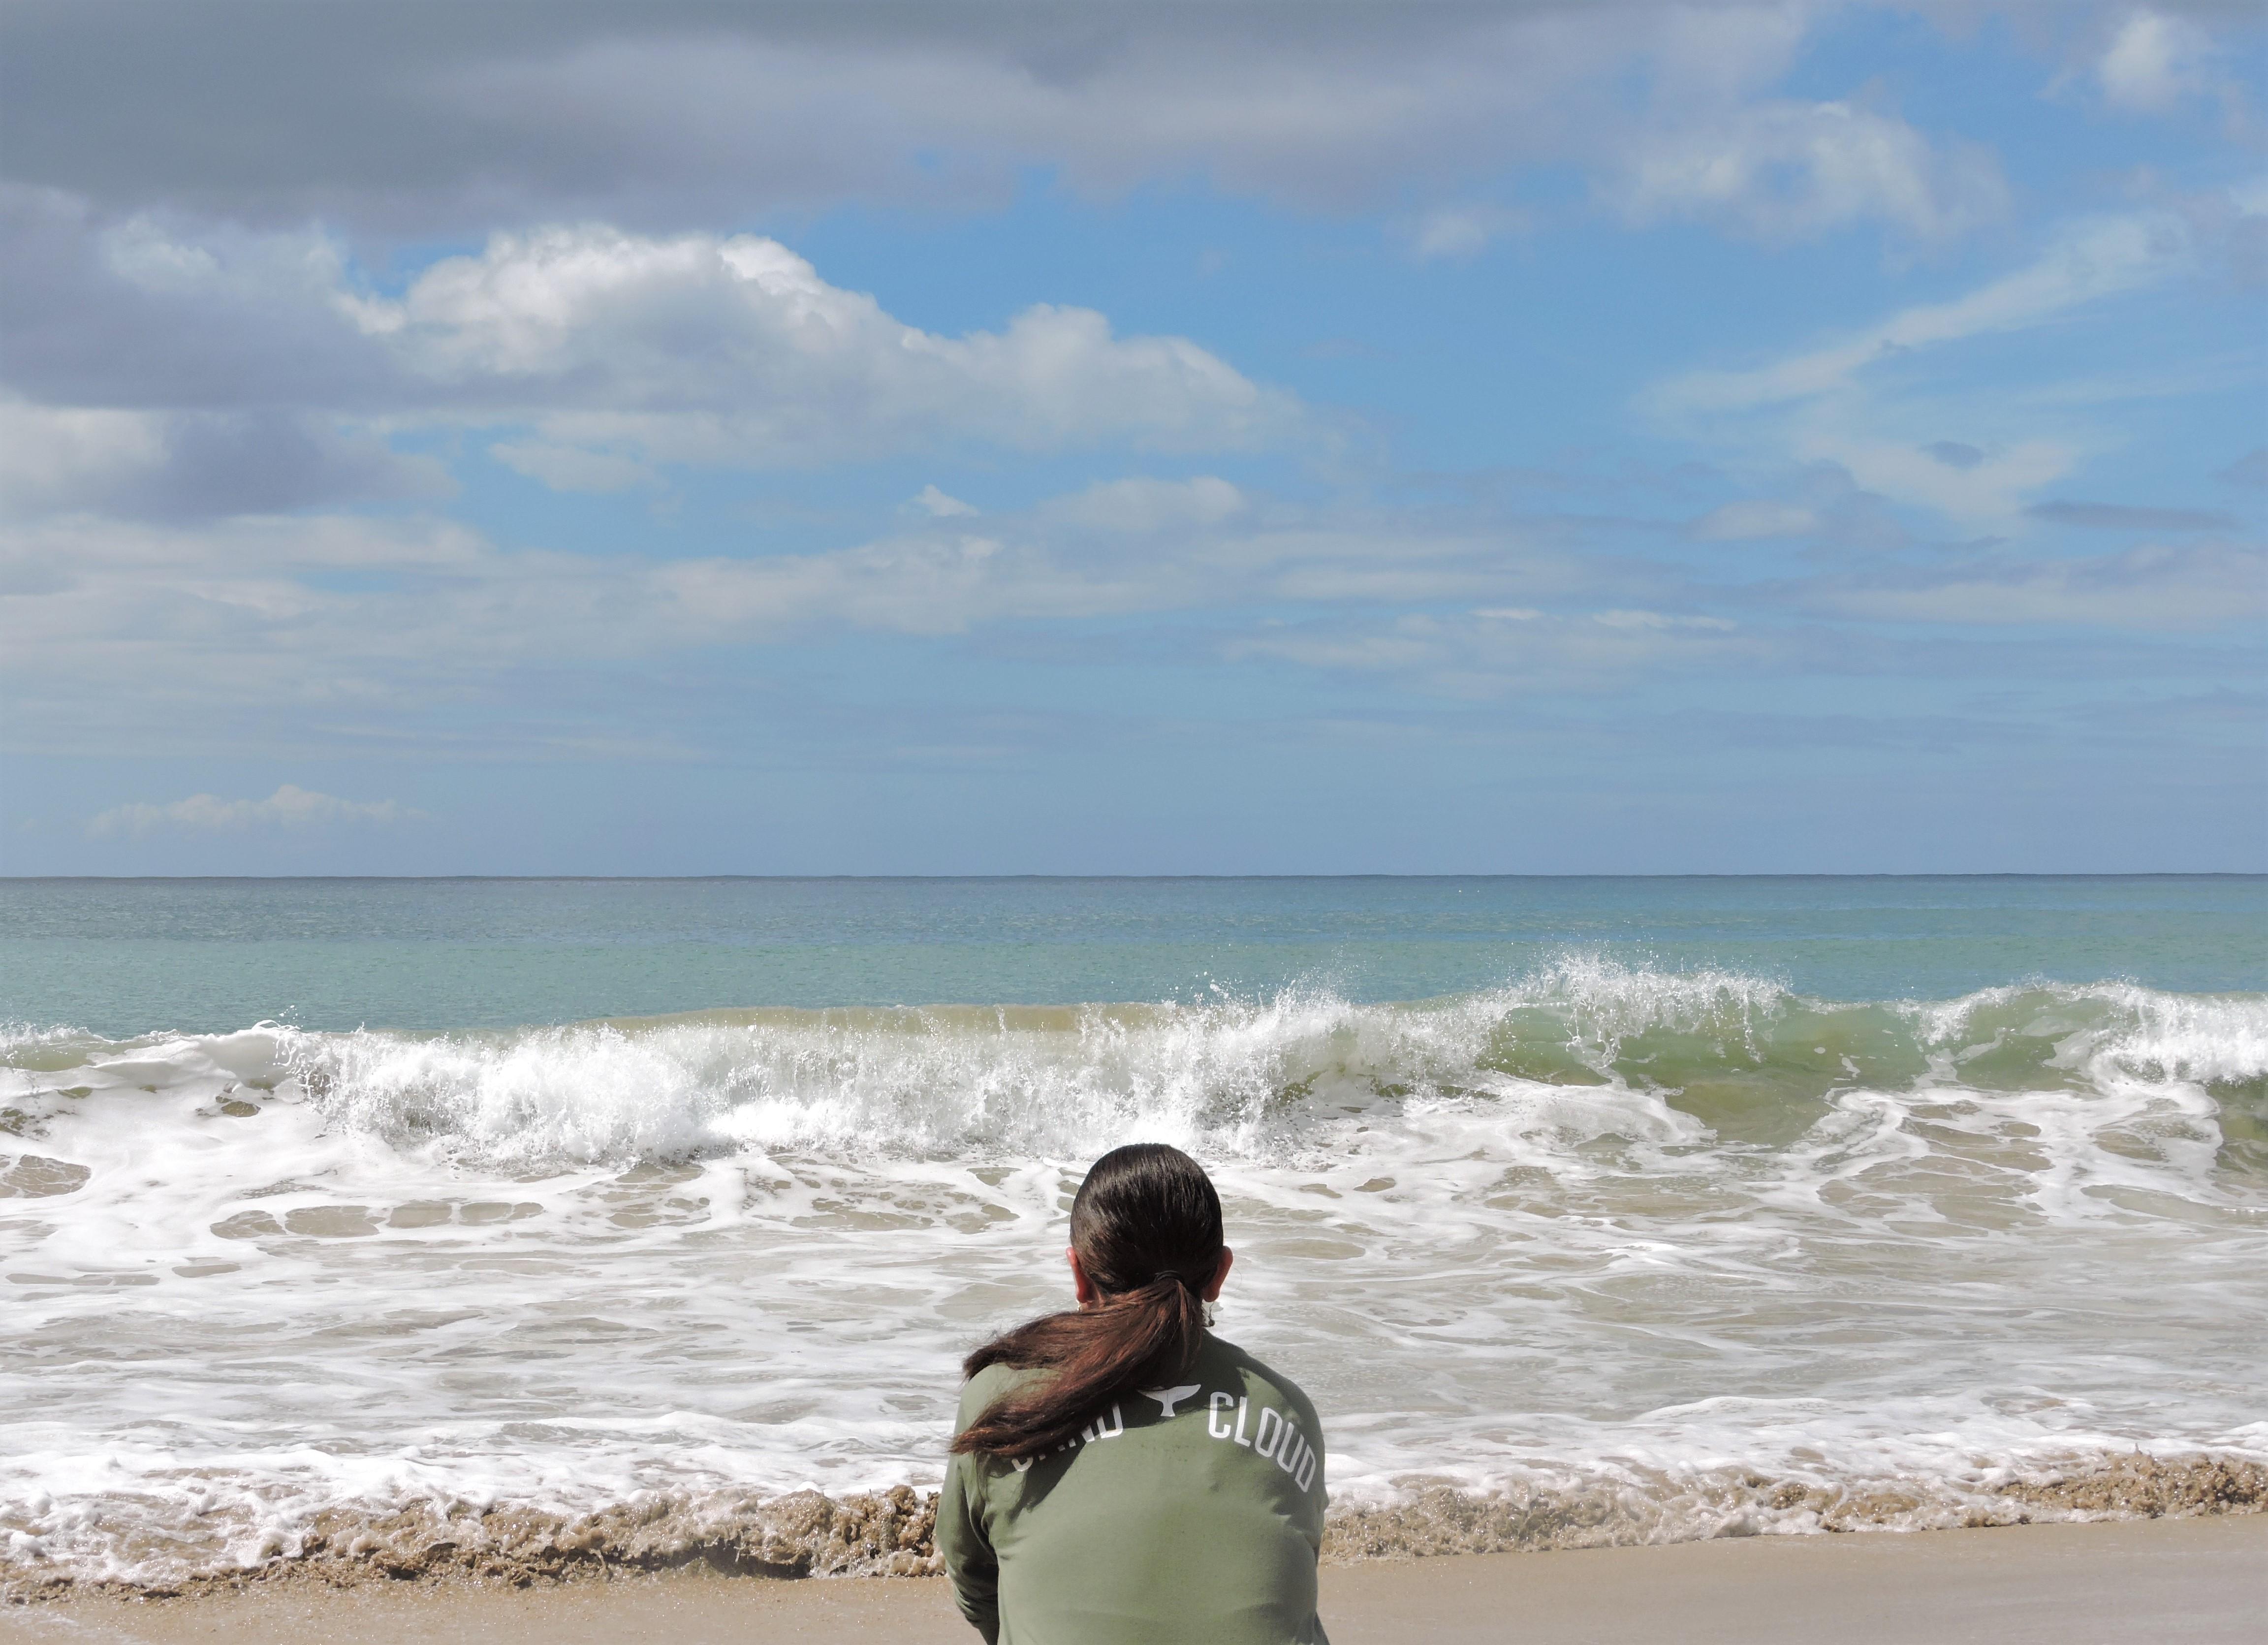 Staring at the Waves Villa Cofresi Rincon Puerto Rico